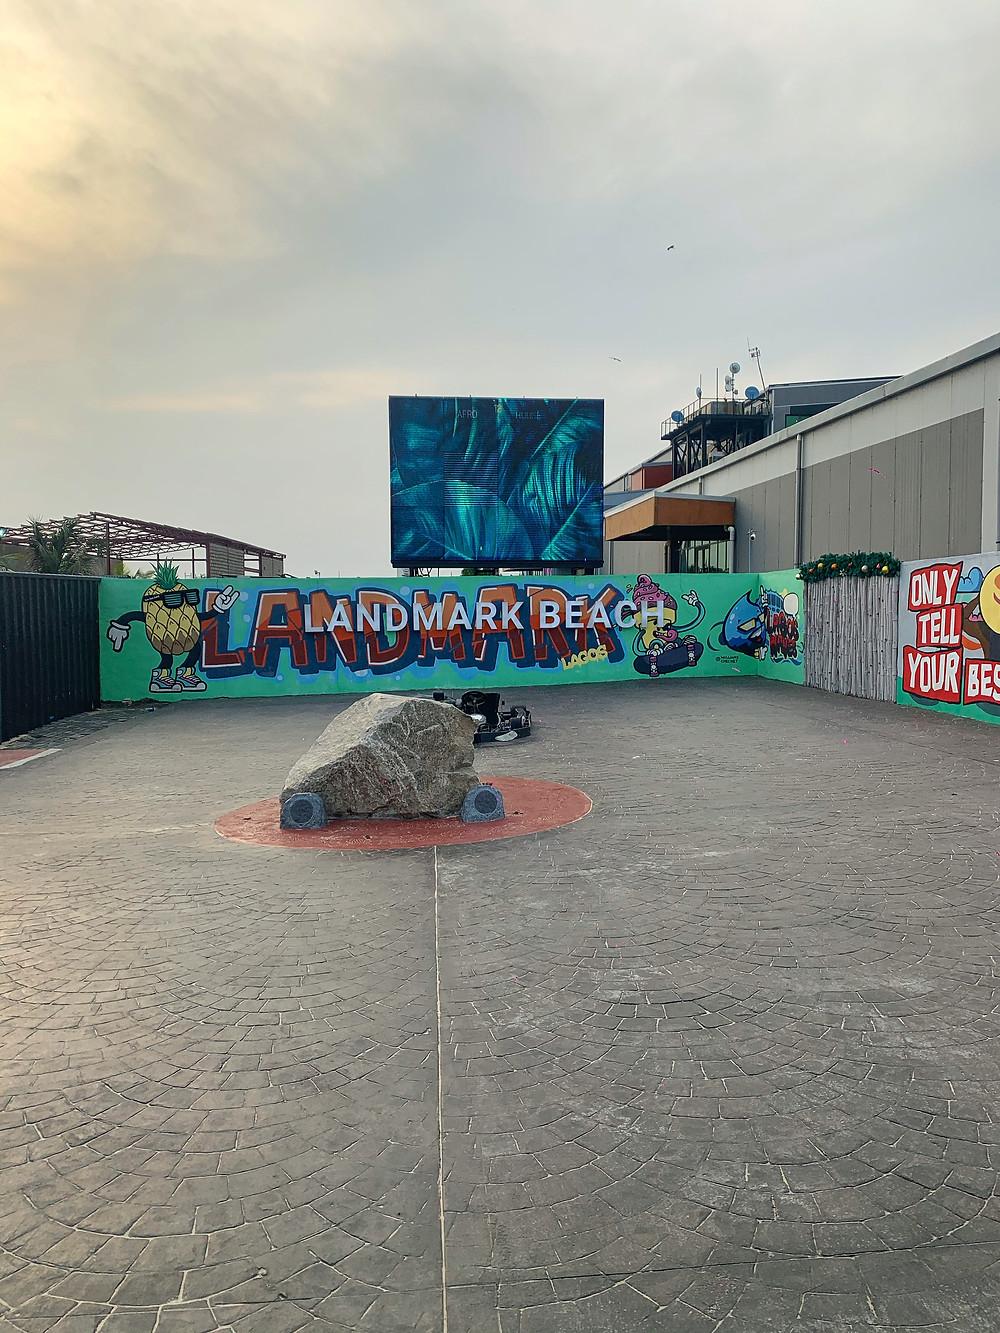 Art at Landmark beach